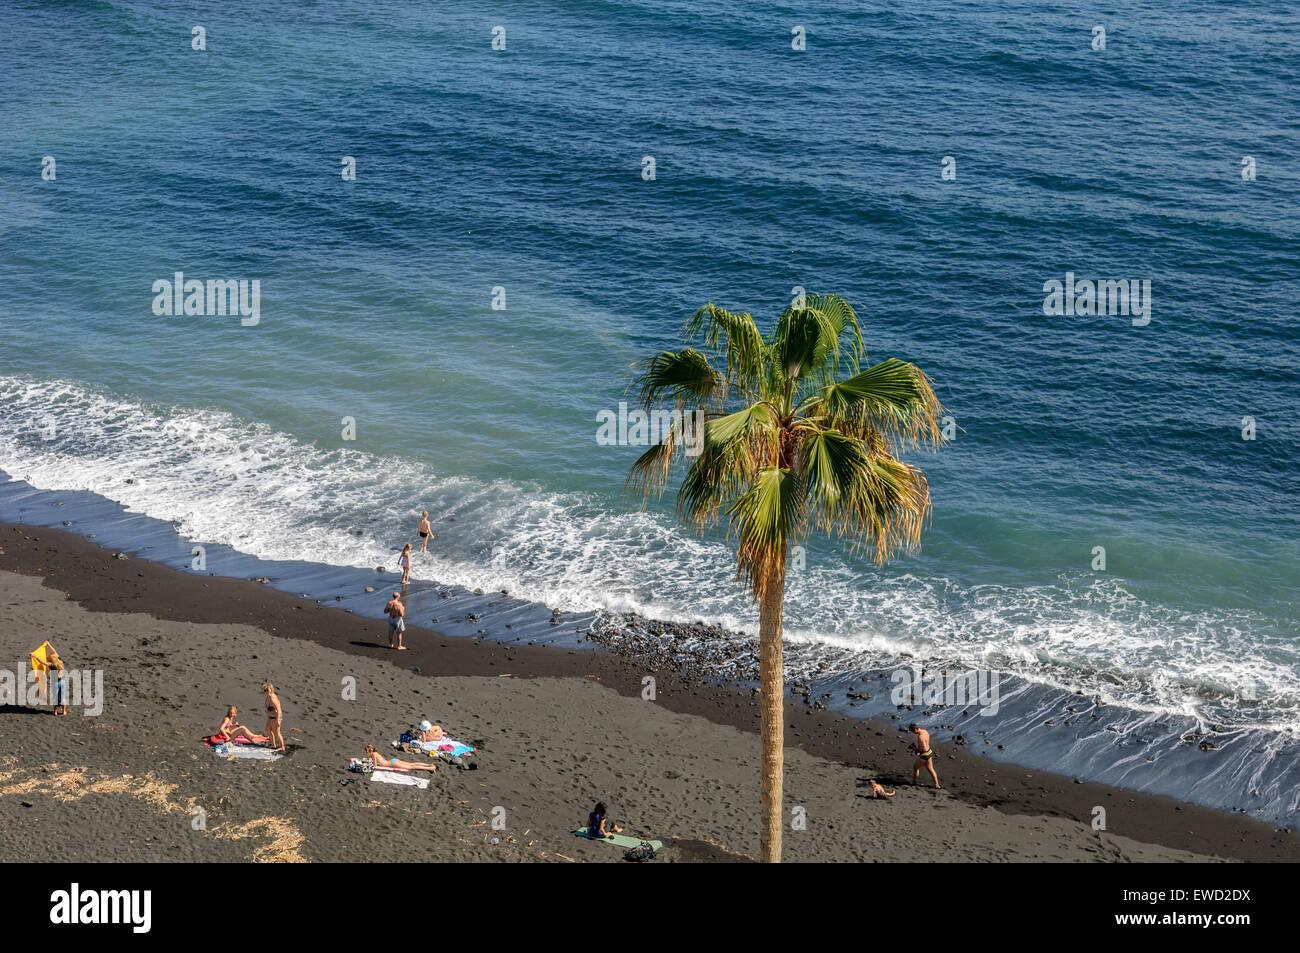 Playa jard n puerto de la cruz tenerife canary islands - Playa jardin puerto de la cruz tenerife ...